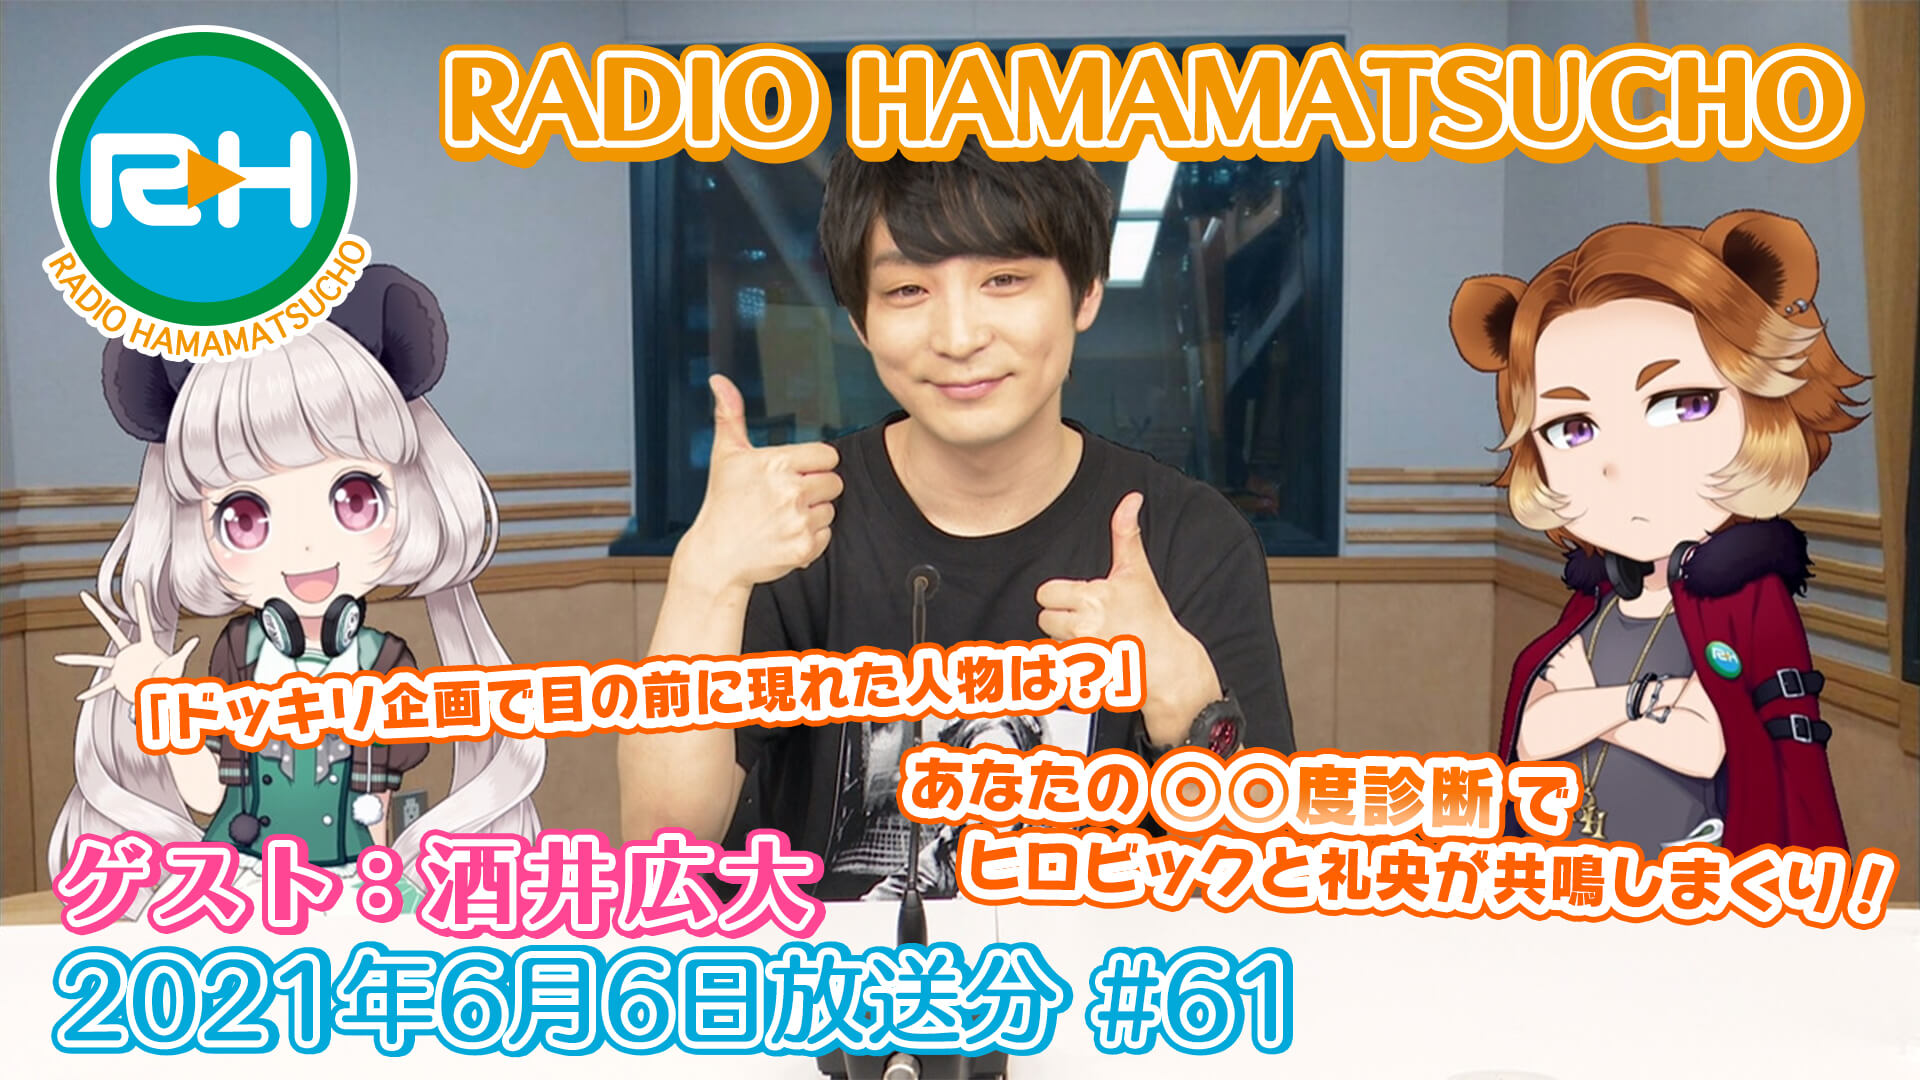 RADIO HAMAMATSUCHO 第61回 (2021年6月6日放送分) ゲスト: 酒井広大